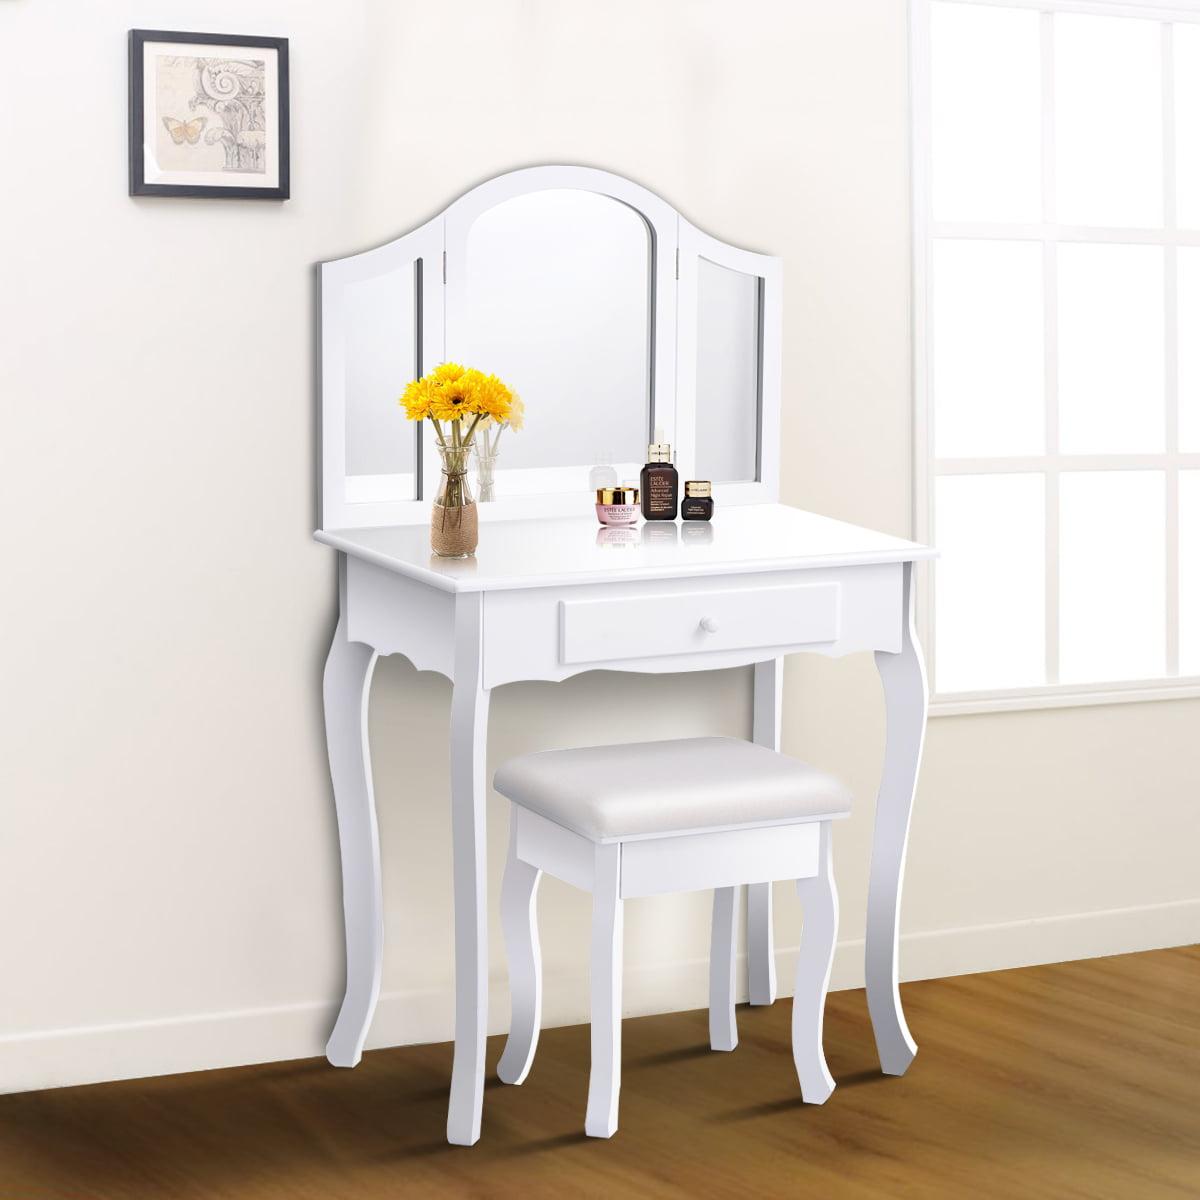 Costway White Tri Folding Mirror Vanity Makeup Table Set bathroom W/Stool & Drawers